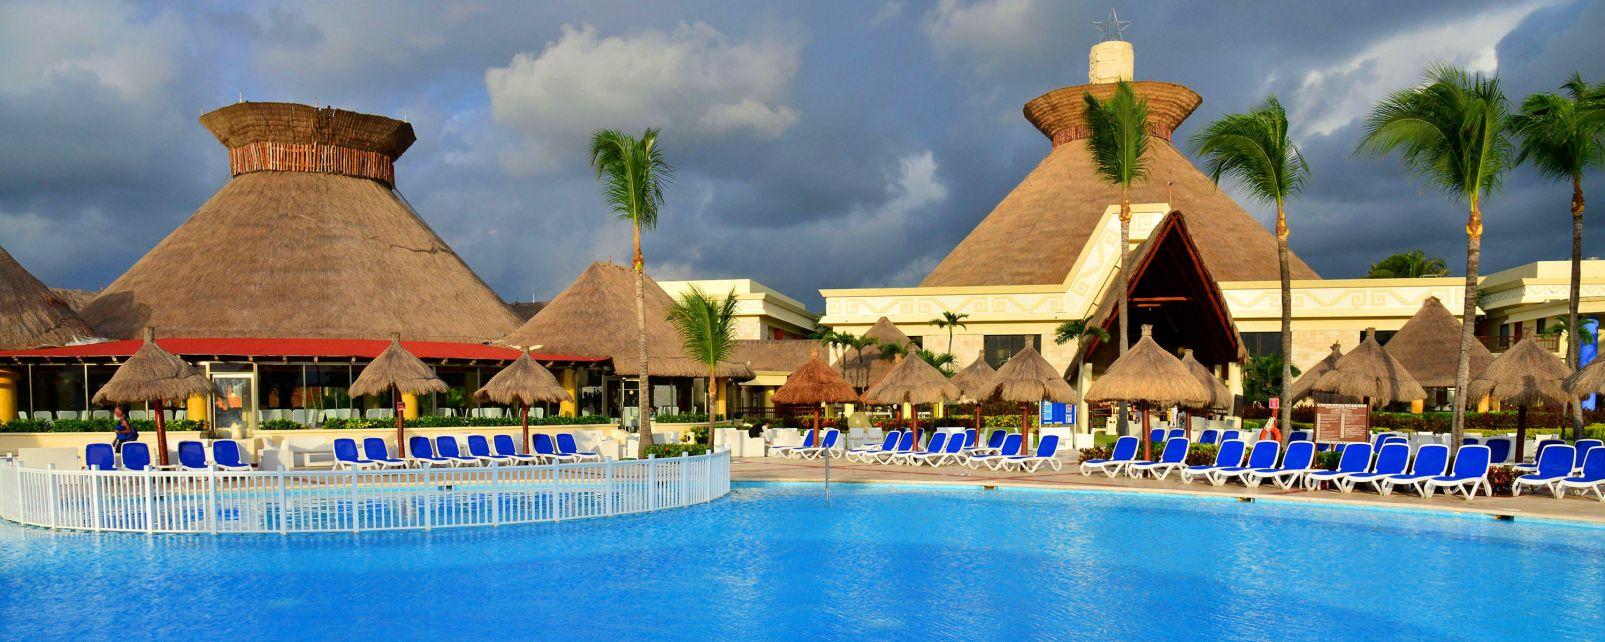 H tel club jet tours hacienda tulum akumal mexique for Hotels tours